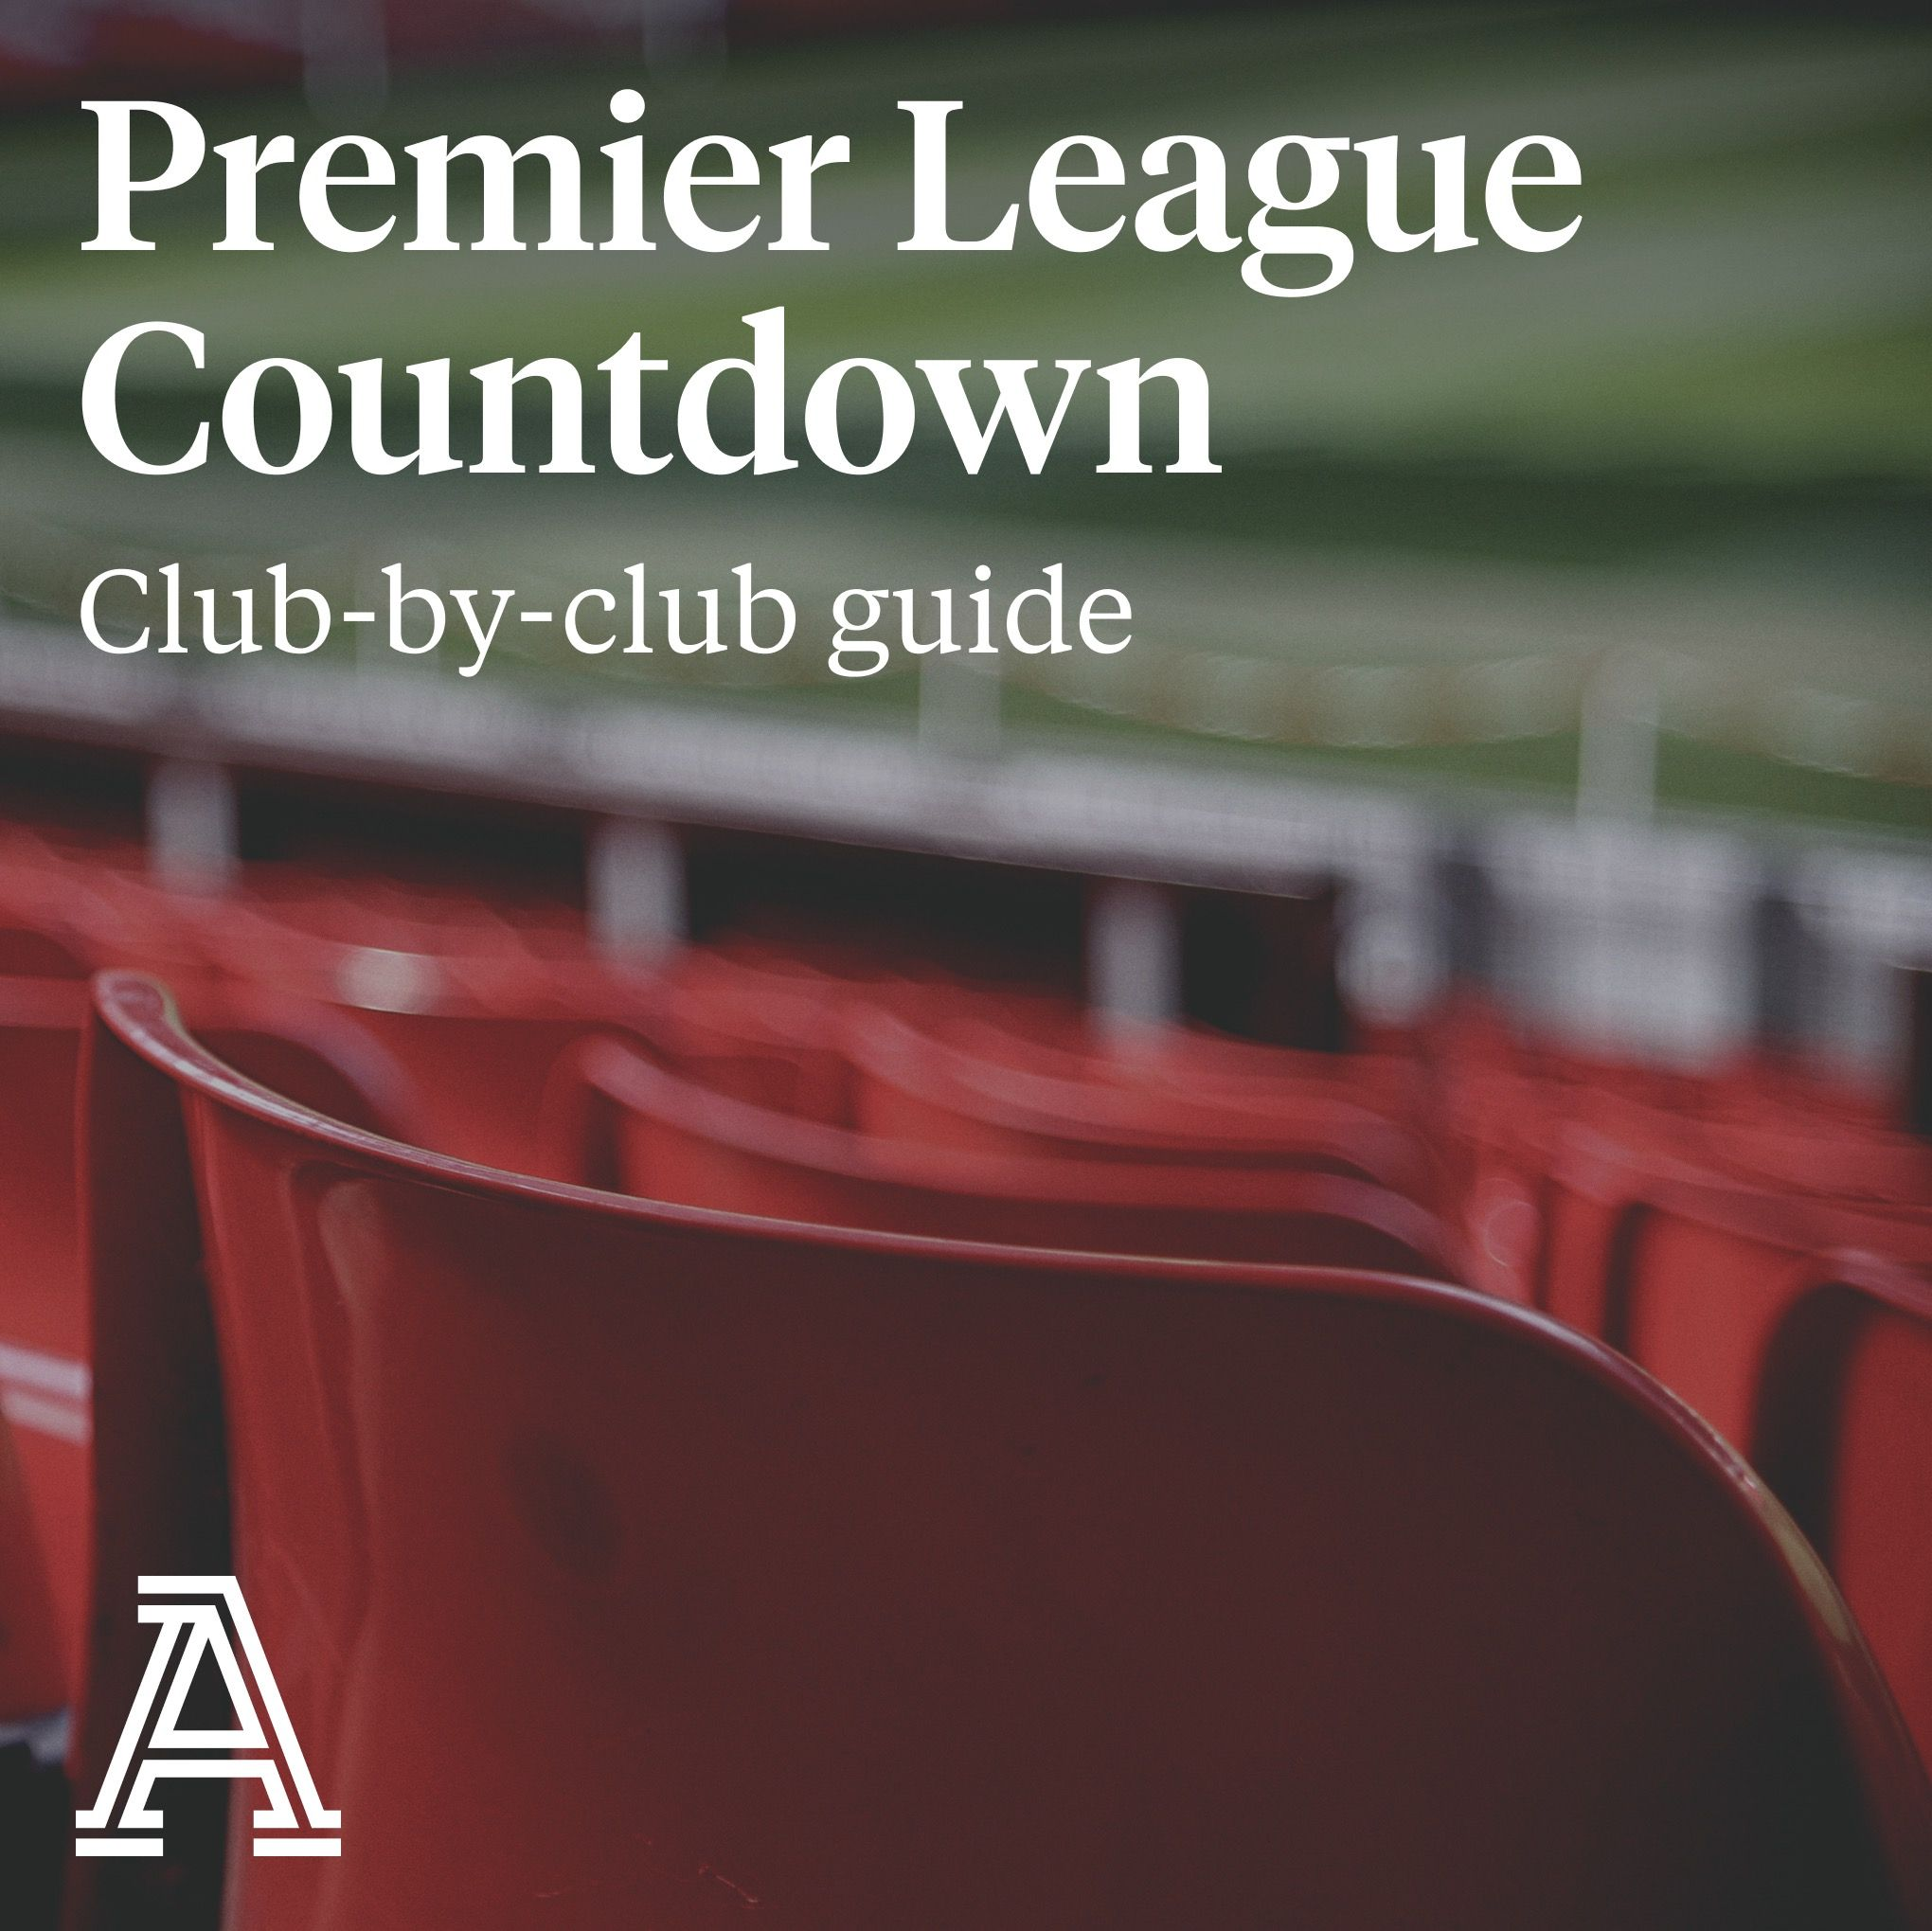 Premier League Countdown - Aston Villa